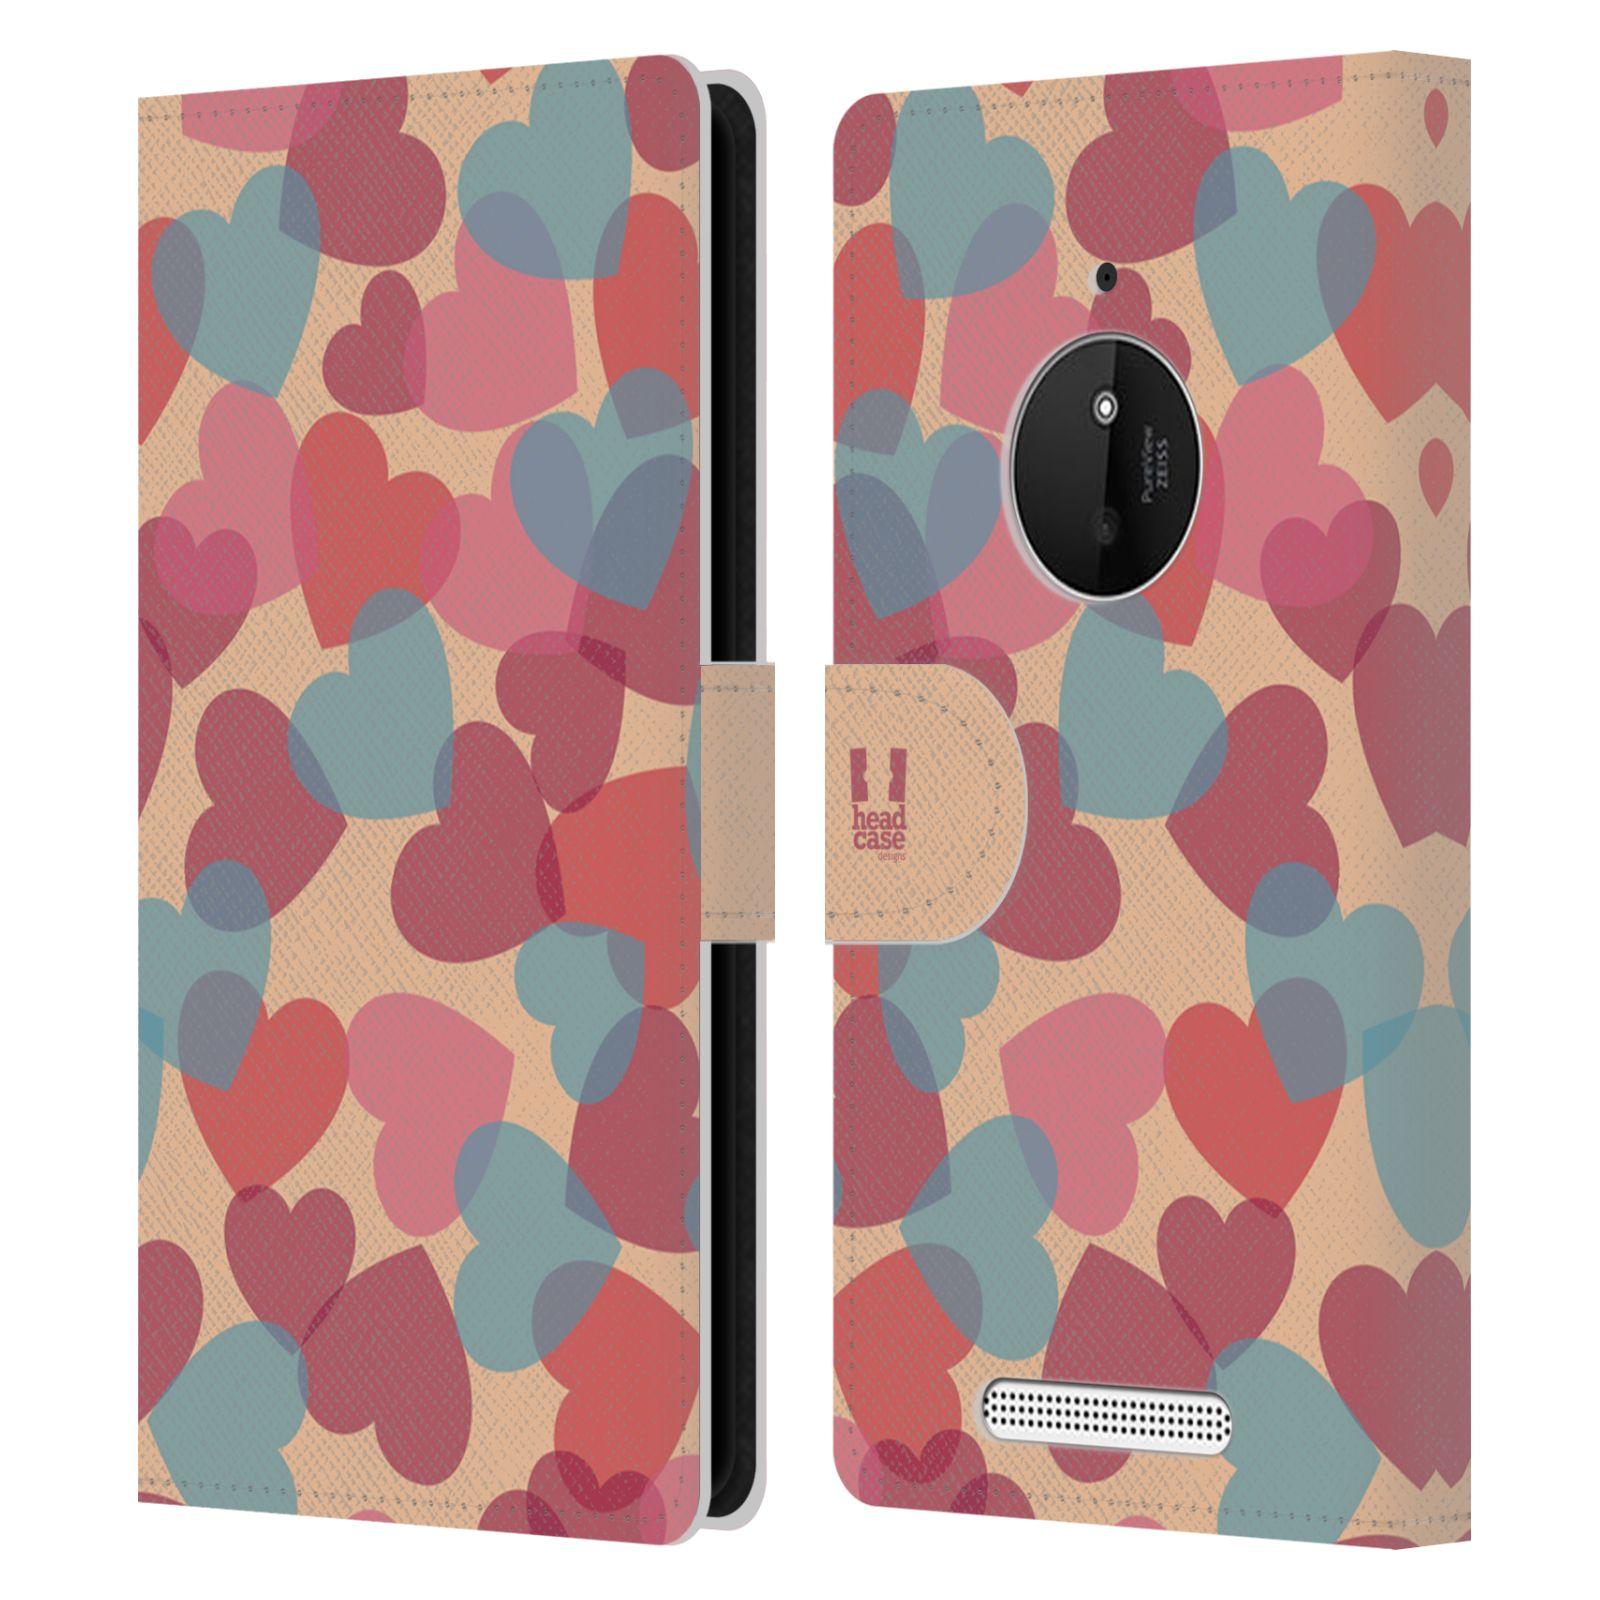 HEAD CASE Flipové pouzdro pro mobil NOKIA LUMIA 830 vzor prolínající se srdíčka, srdce, láska, růžová